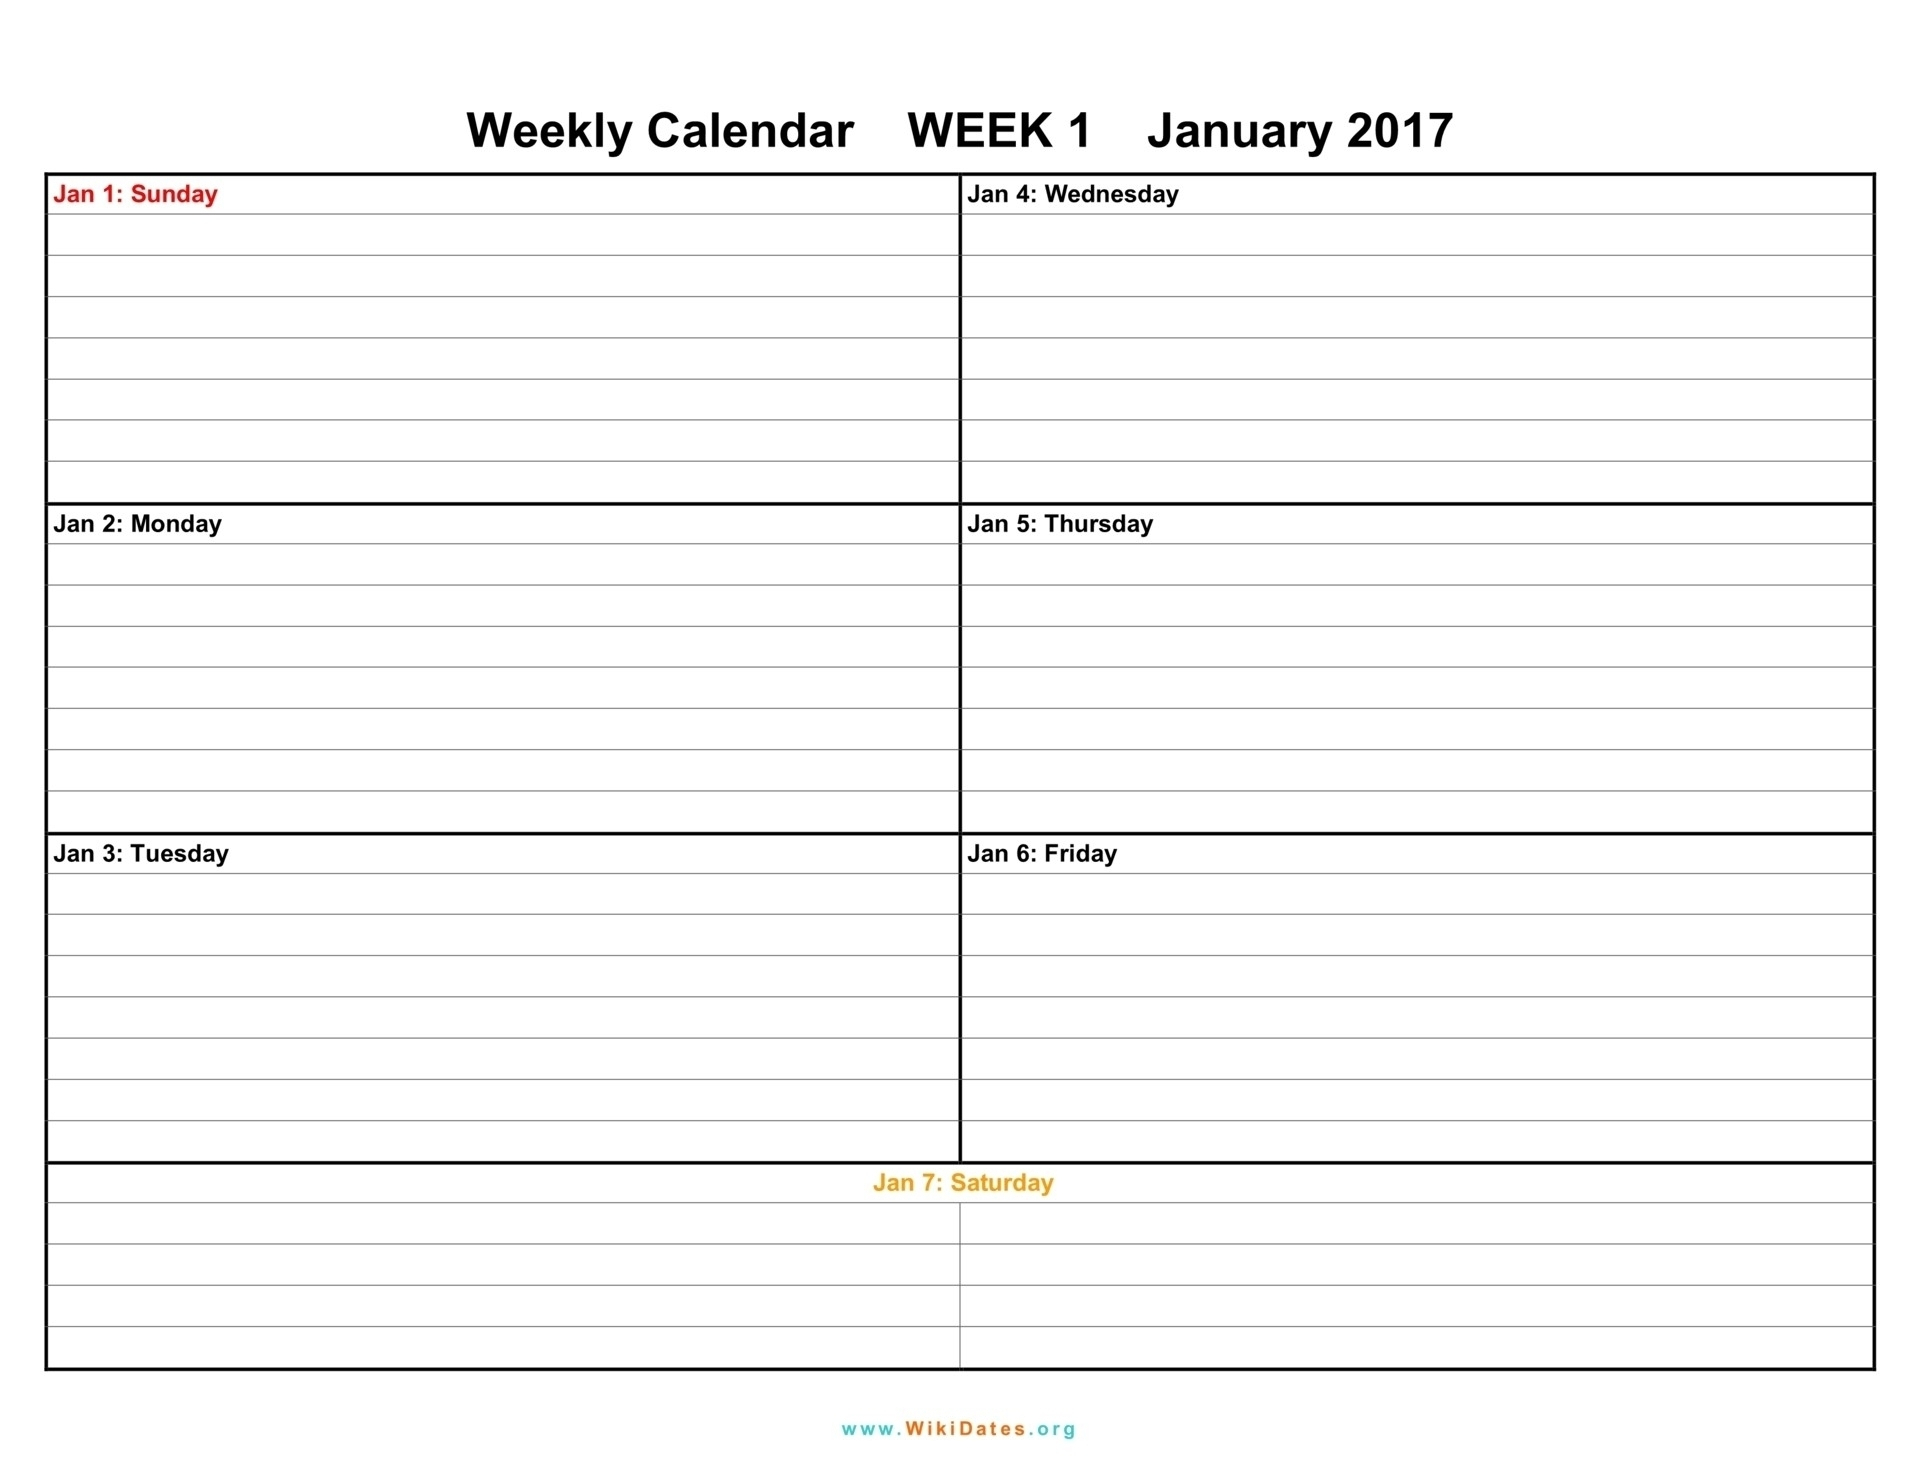 Calendar Template 1 Week – Get Your Calendar Printable intended for 1 Week Blank Calendar Template